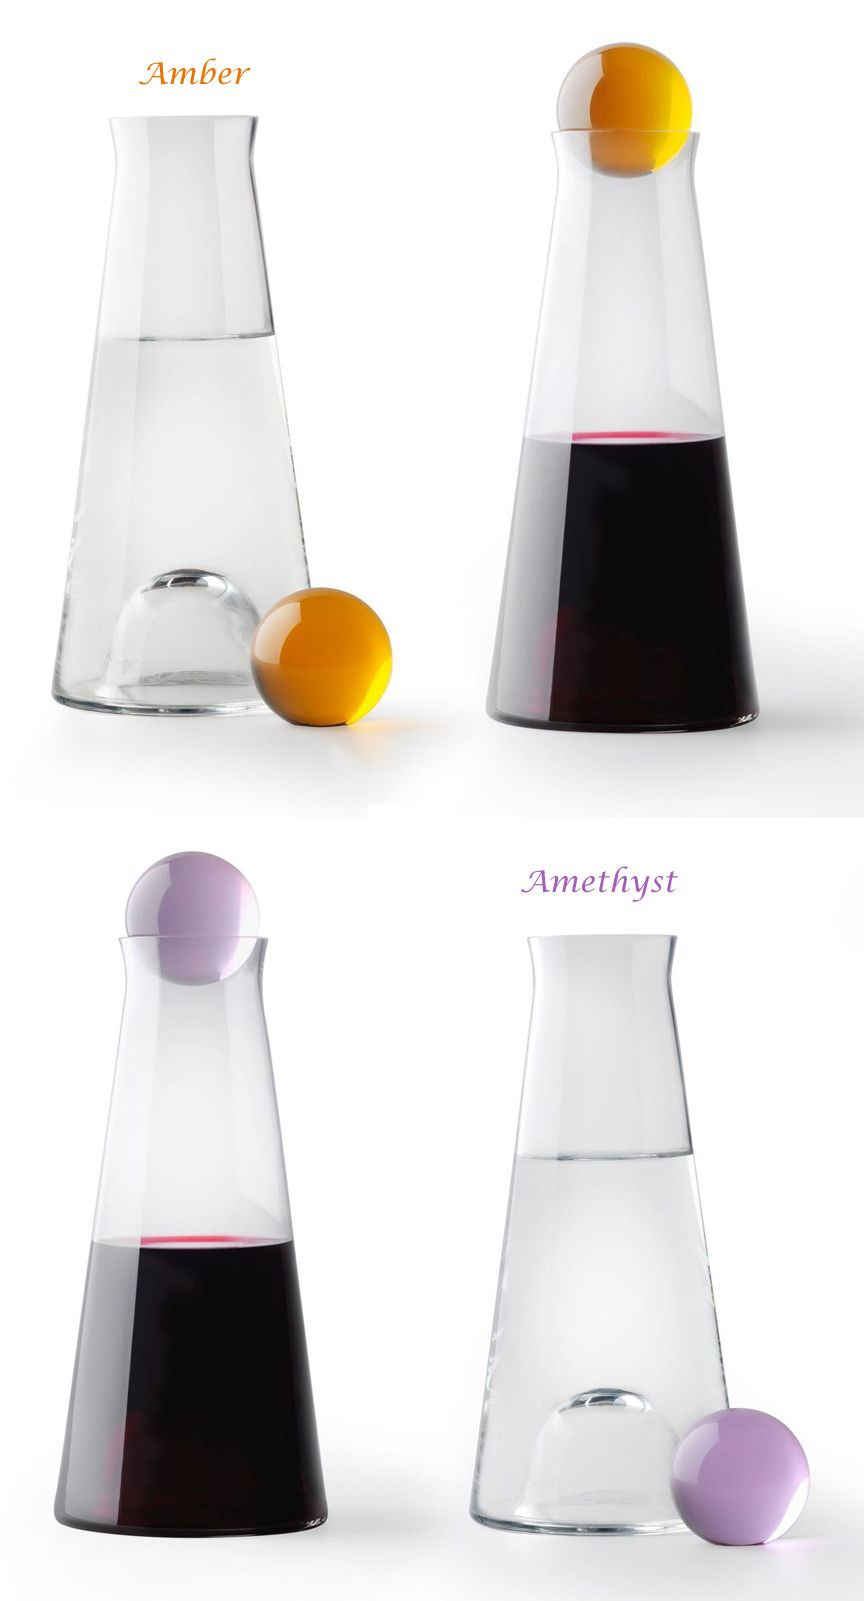 Nordic Modern Murano Style Water Bottle 34 Oz Water Carafe With Lid Water Carafe Glass Water Carafe Modern Water Carafe